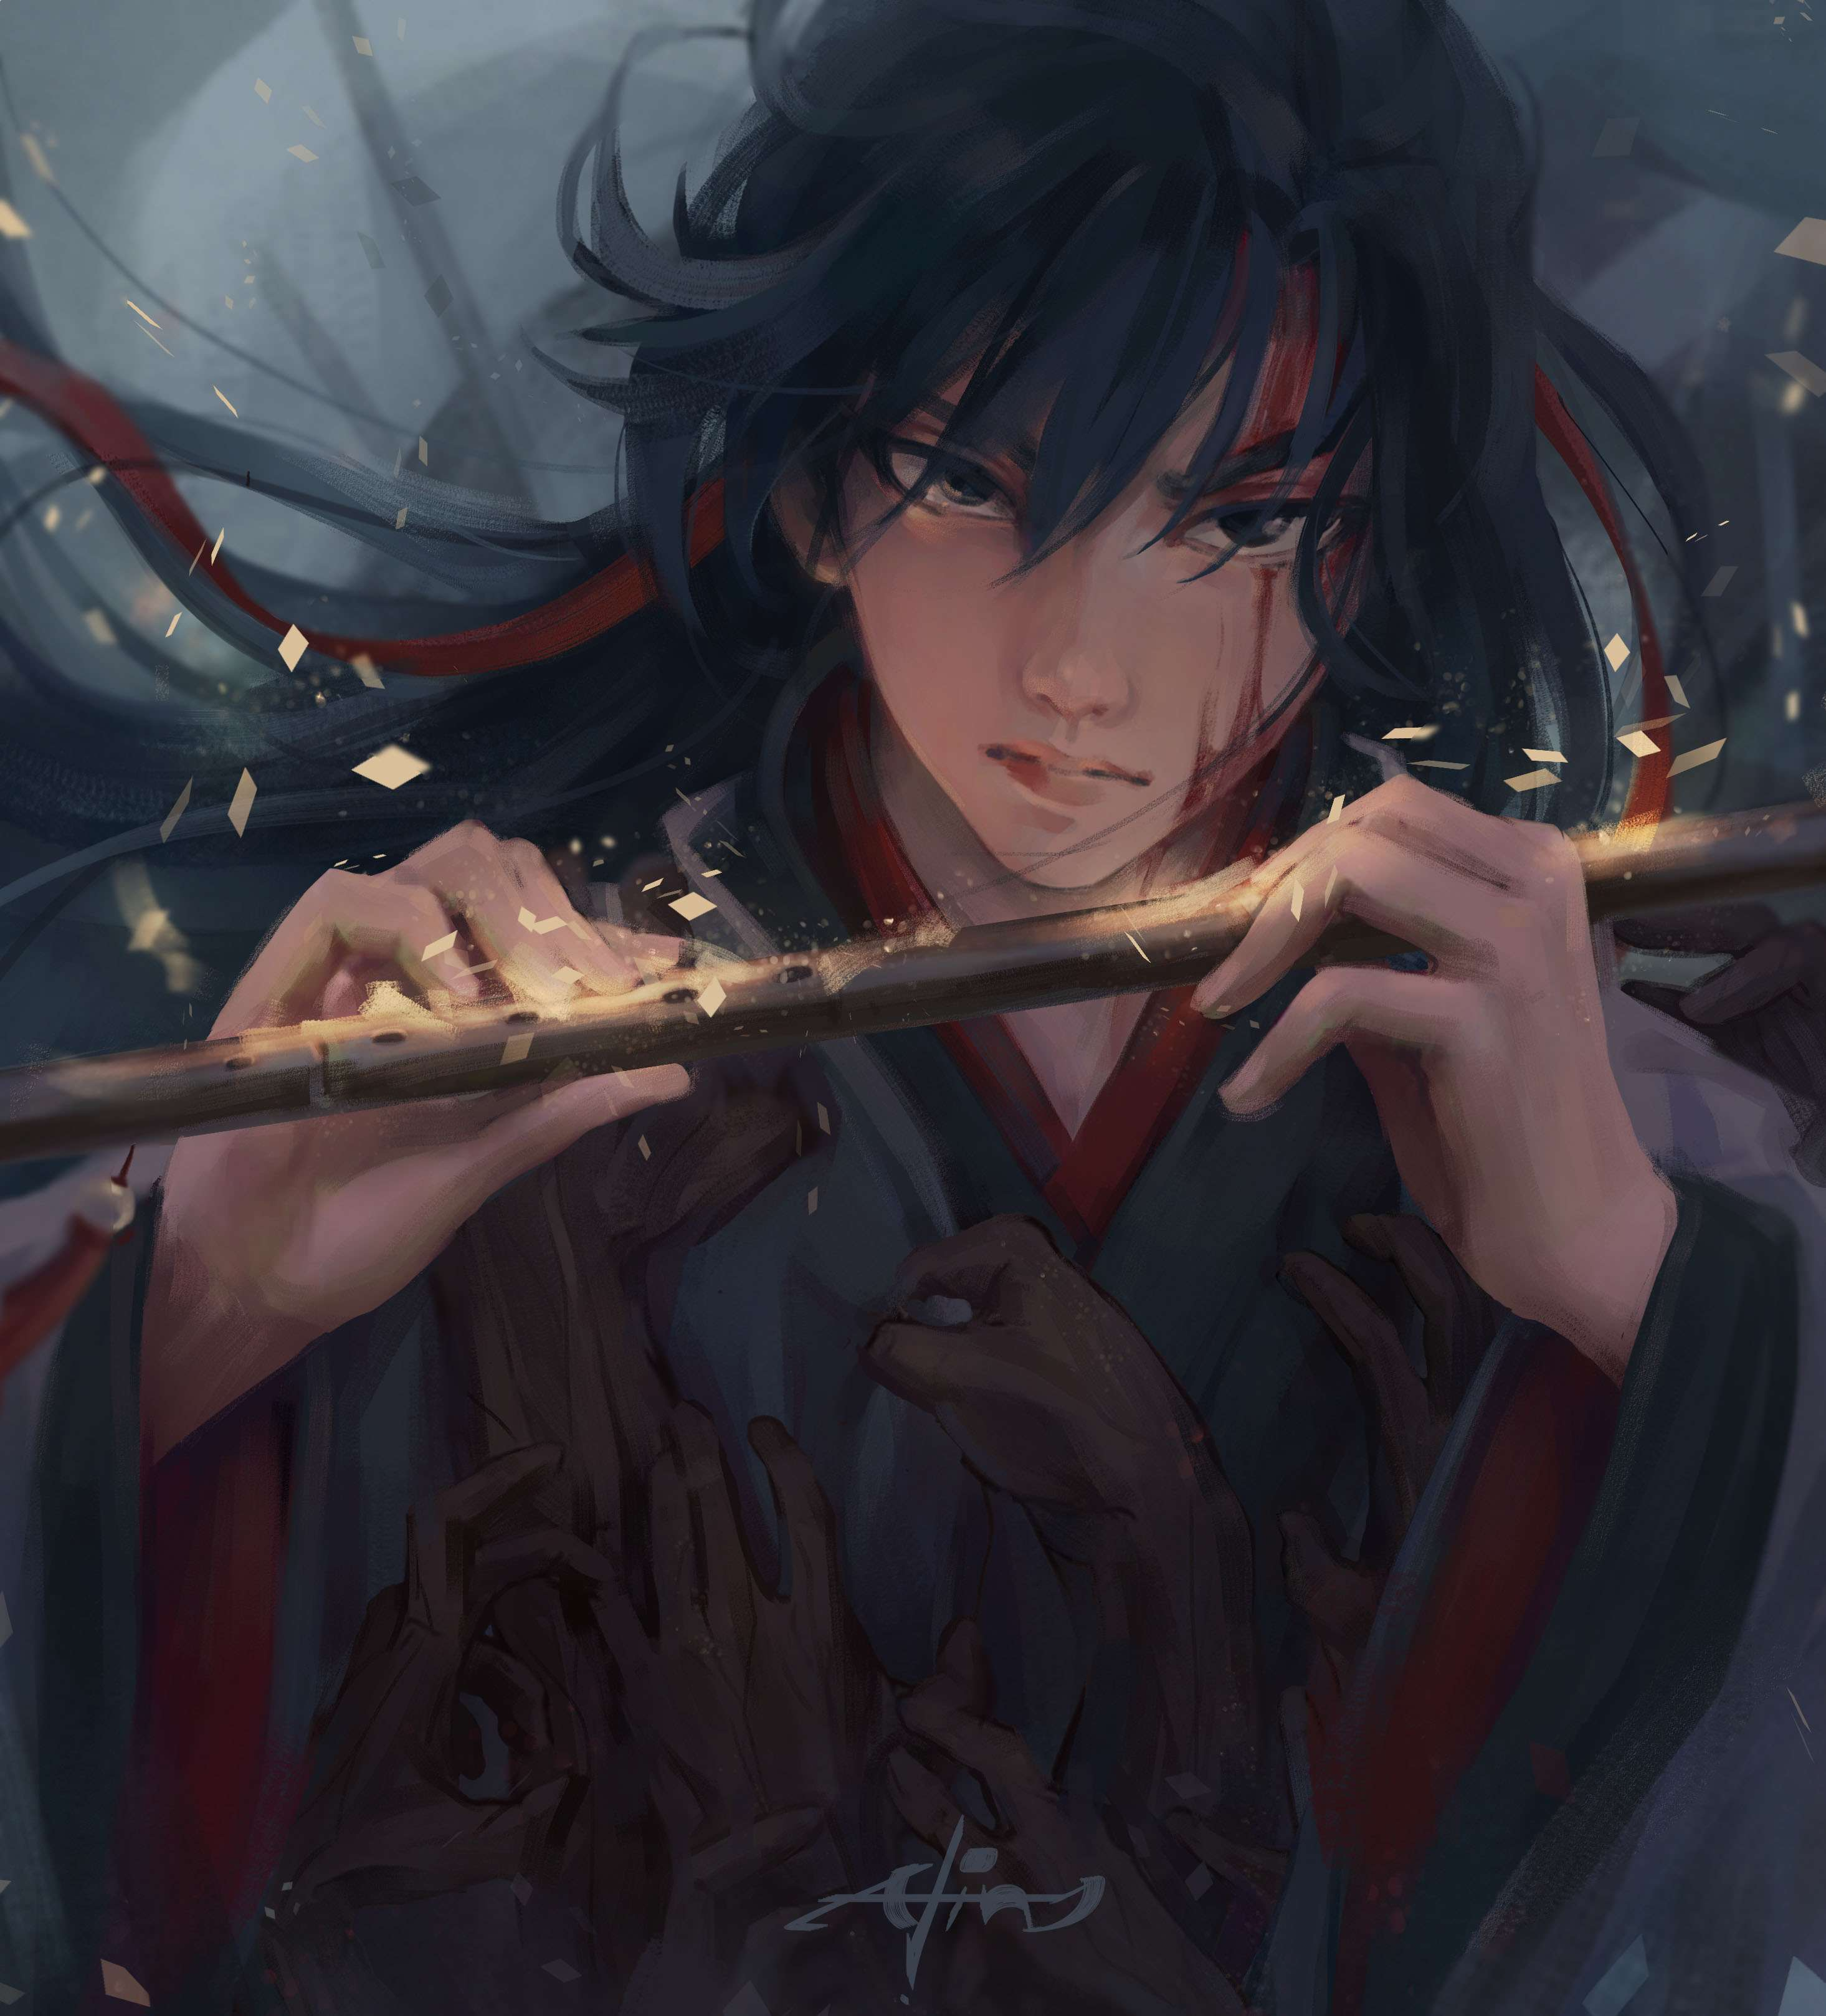 Wei Wuxian (สมกับเป็นท่าน)